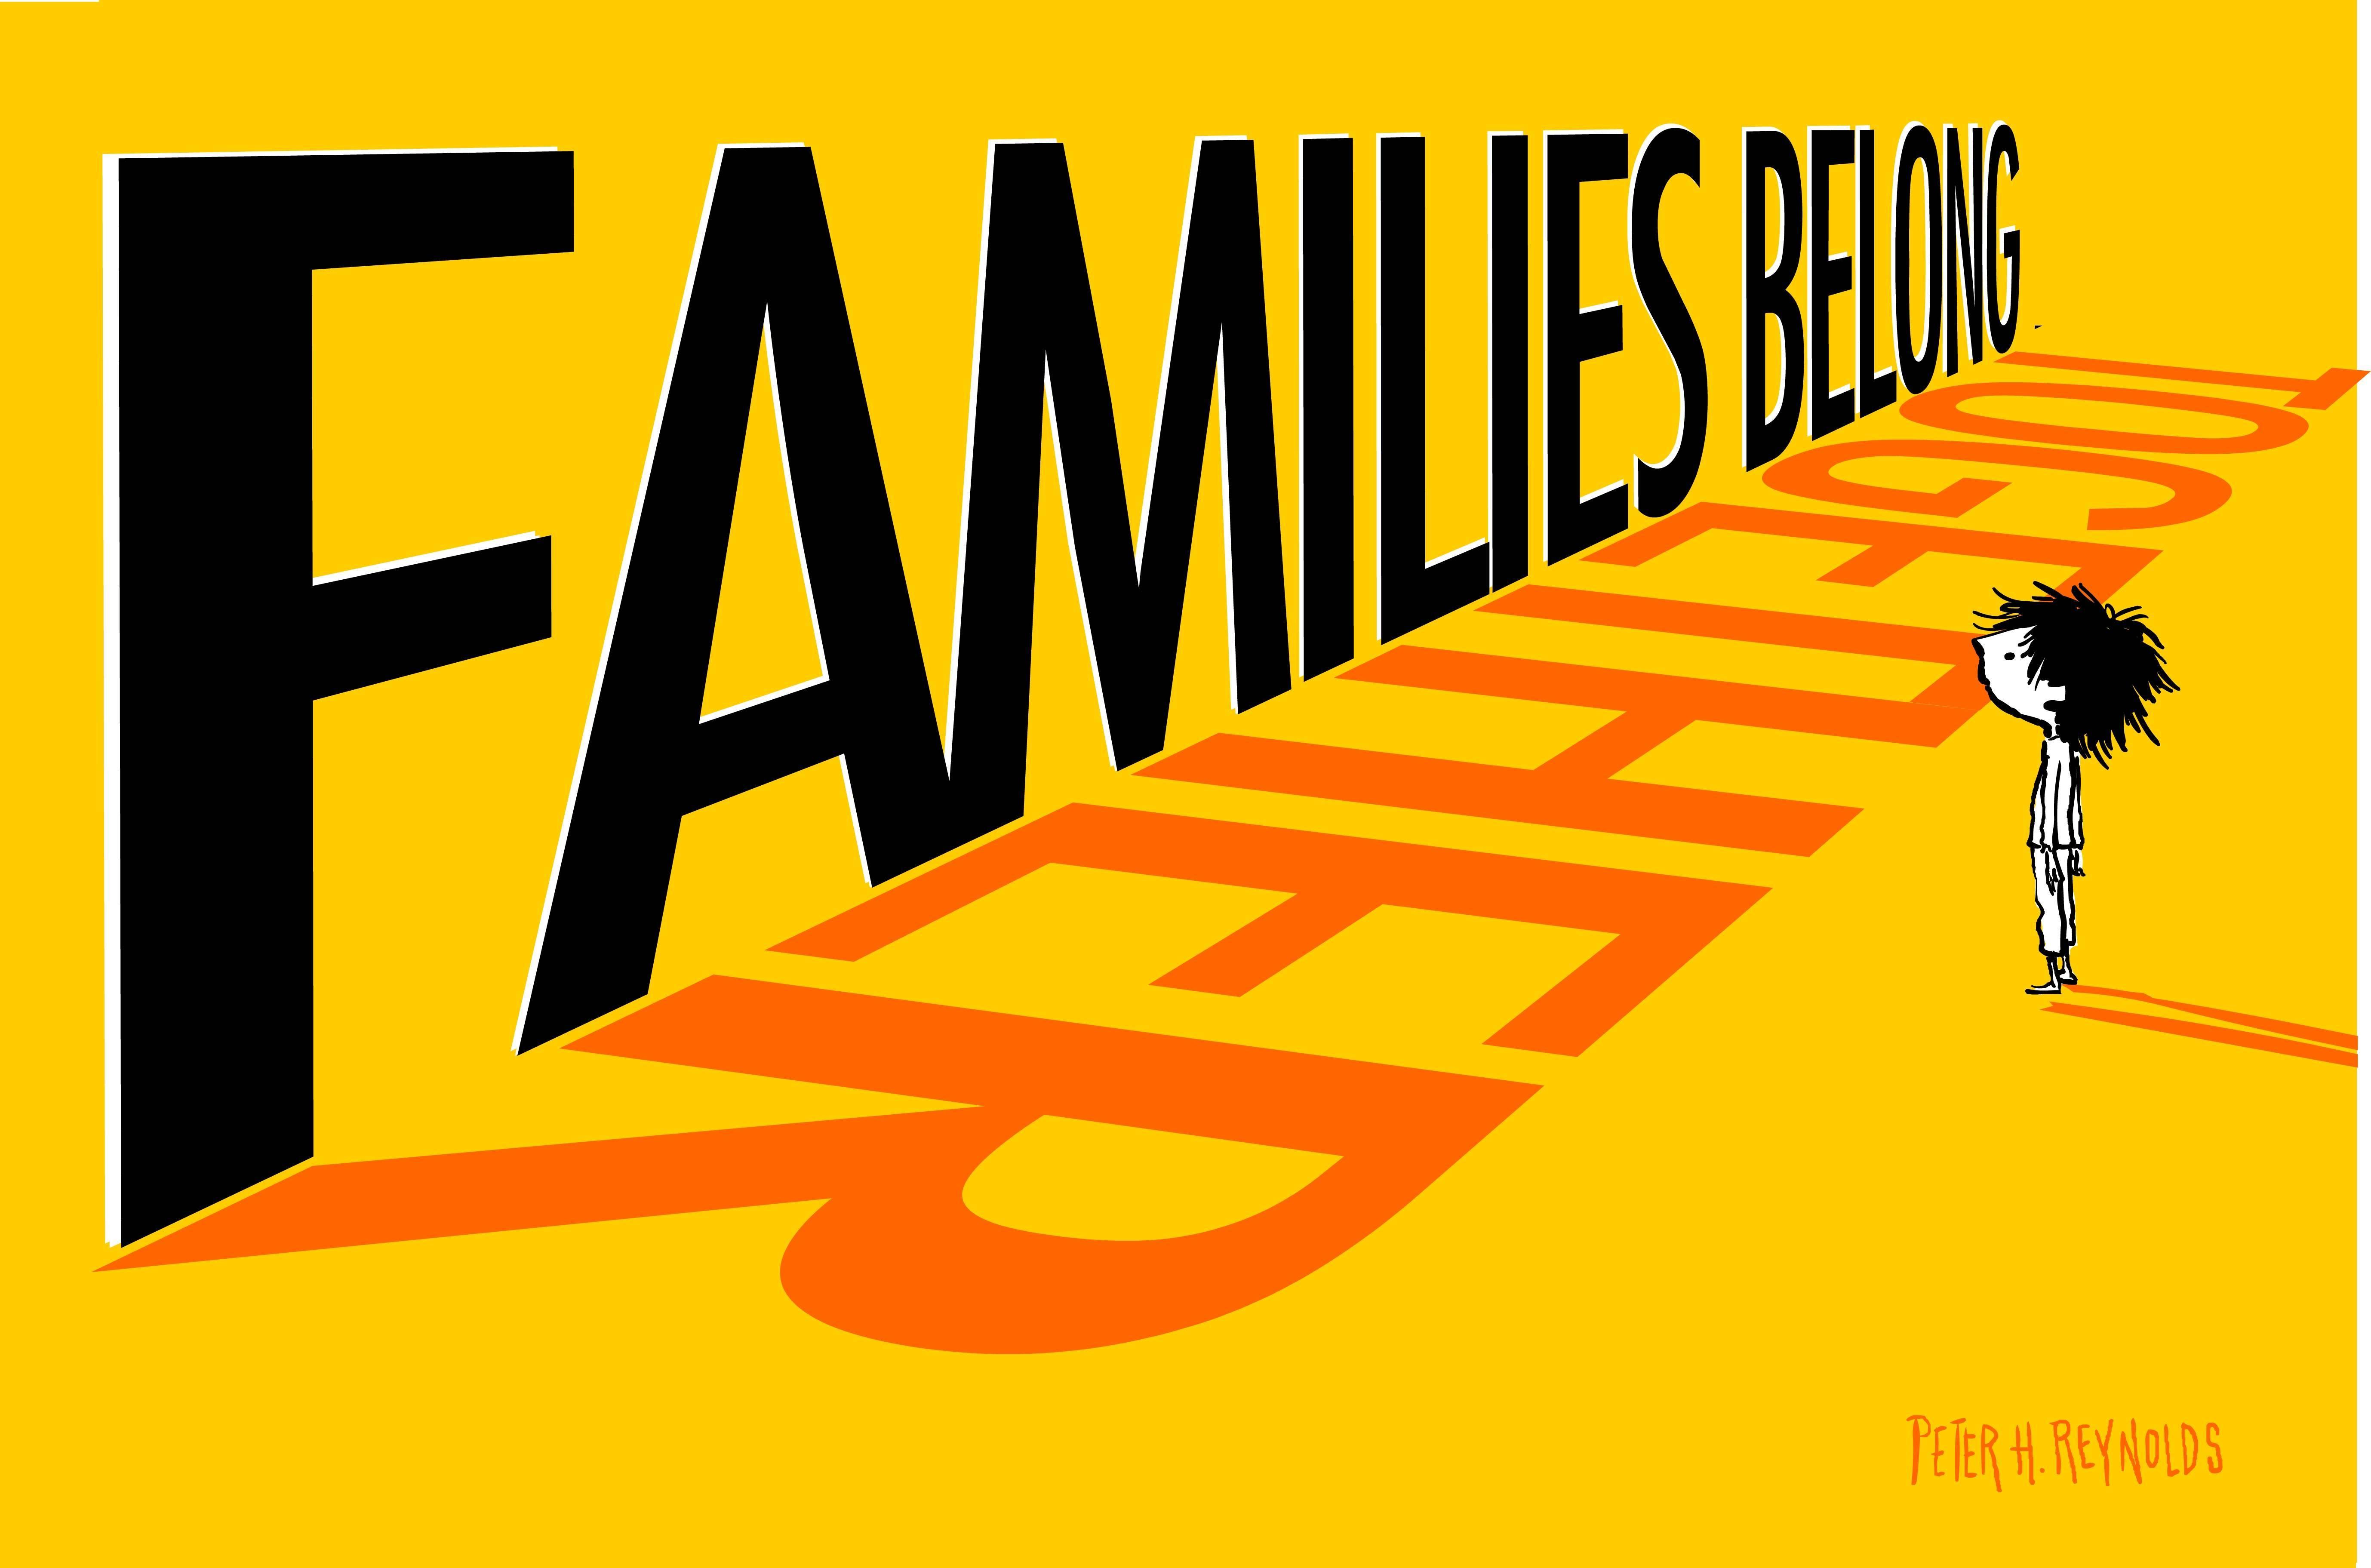 a563ad6faf797bf8314b_families_belong_together__Peter_H_Reyolds.jpg